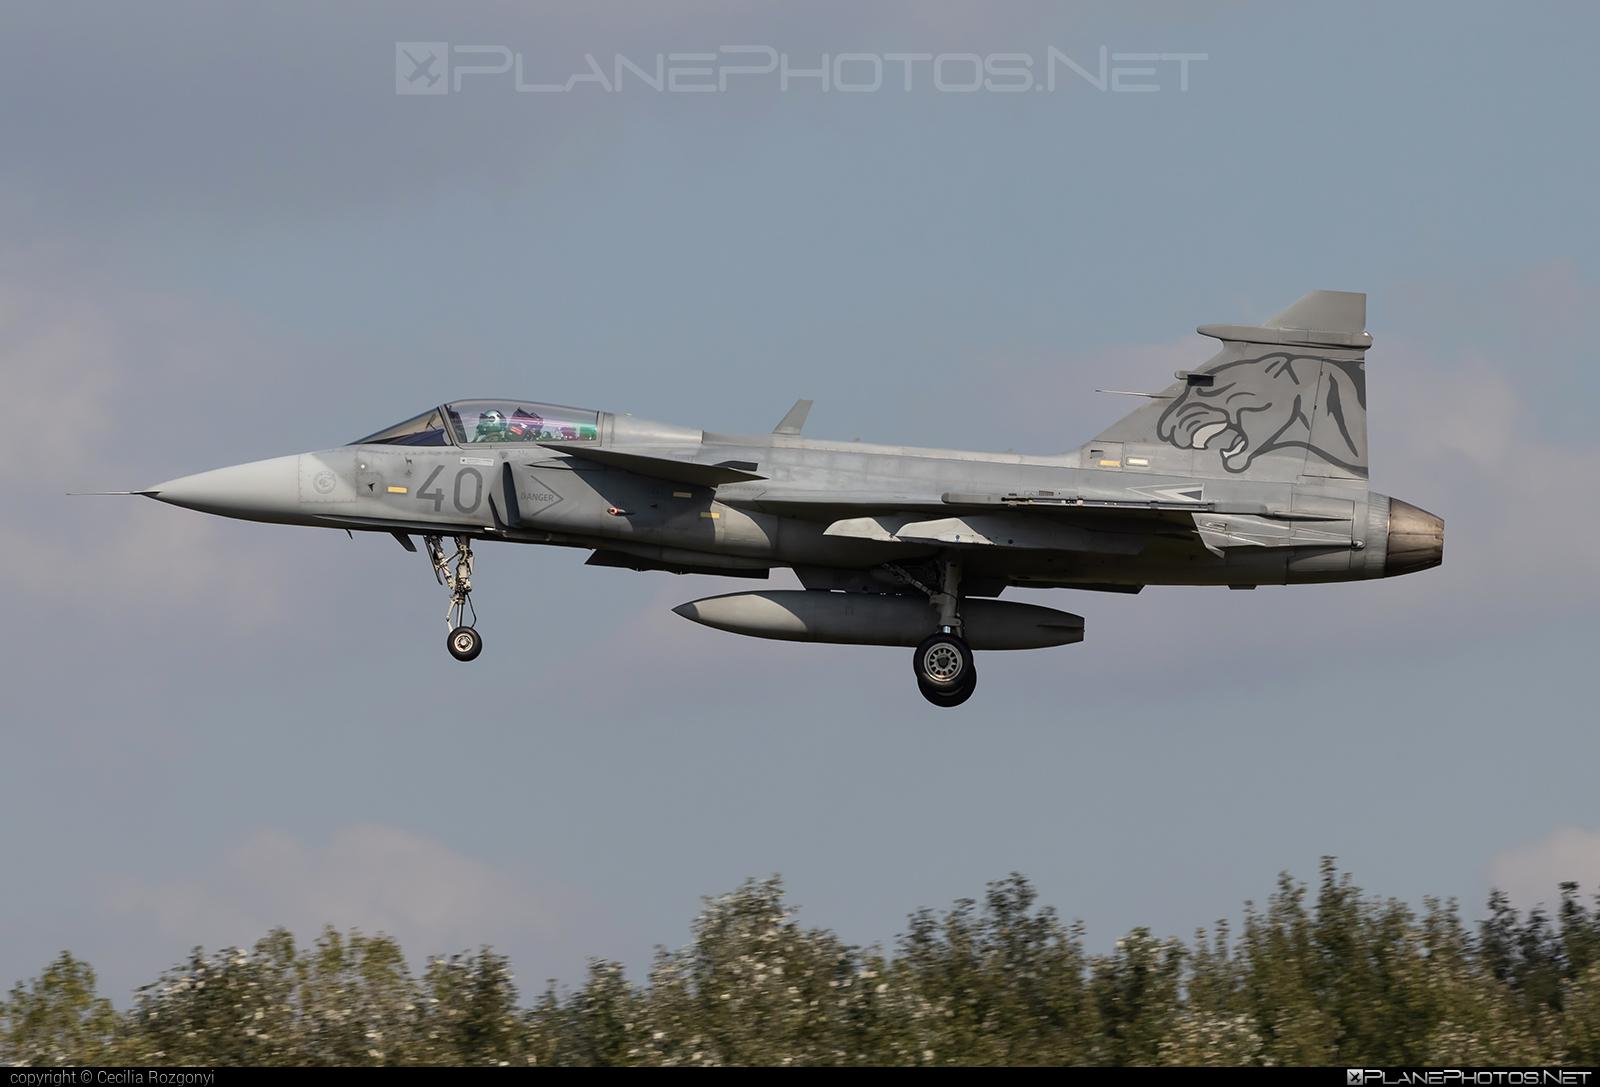 Saab JAS 39C Gripen - 40 operated by Magyar Légierő (Hungarian Air Force) #KecskemetAirBase #PumaSquadron #gripen #hungarianairforce #jas39 #jas39c #jas39gripen #magyarlegiero #saab